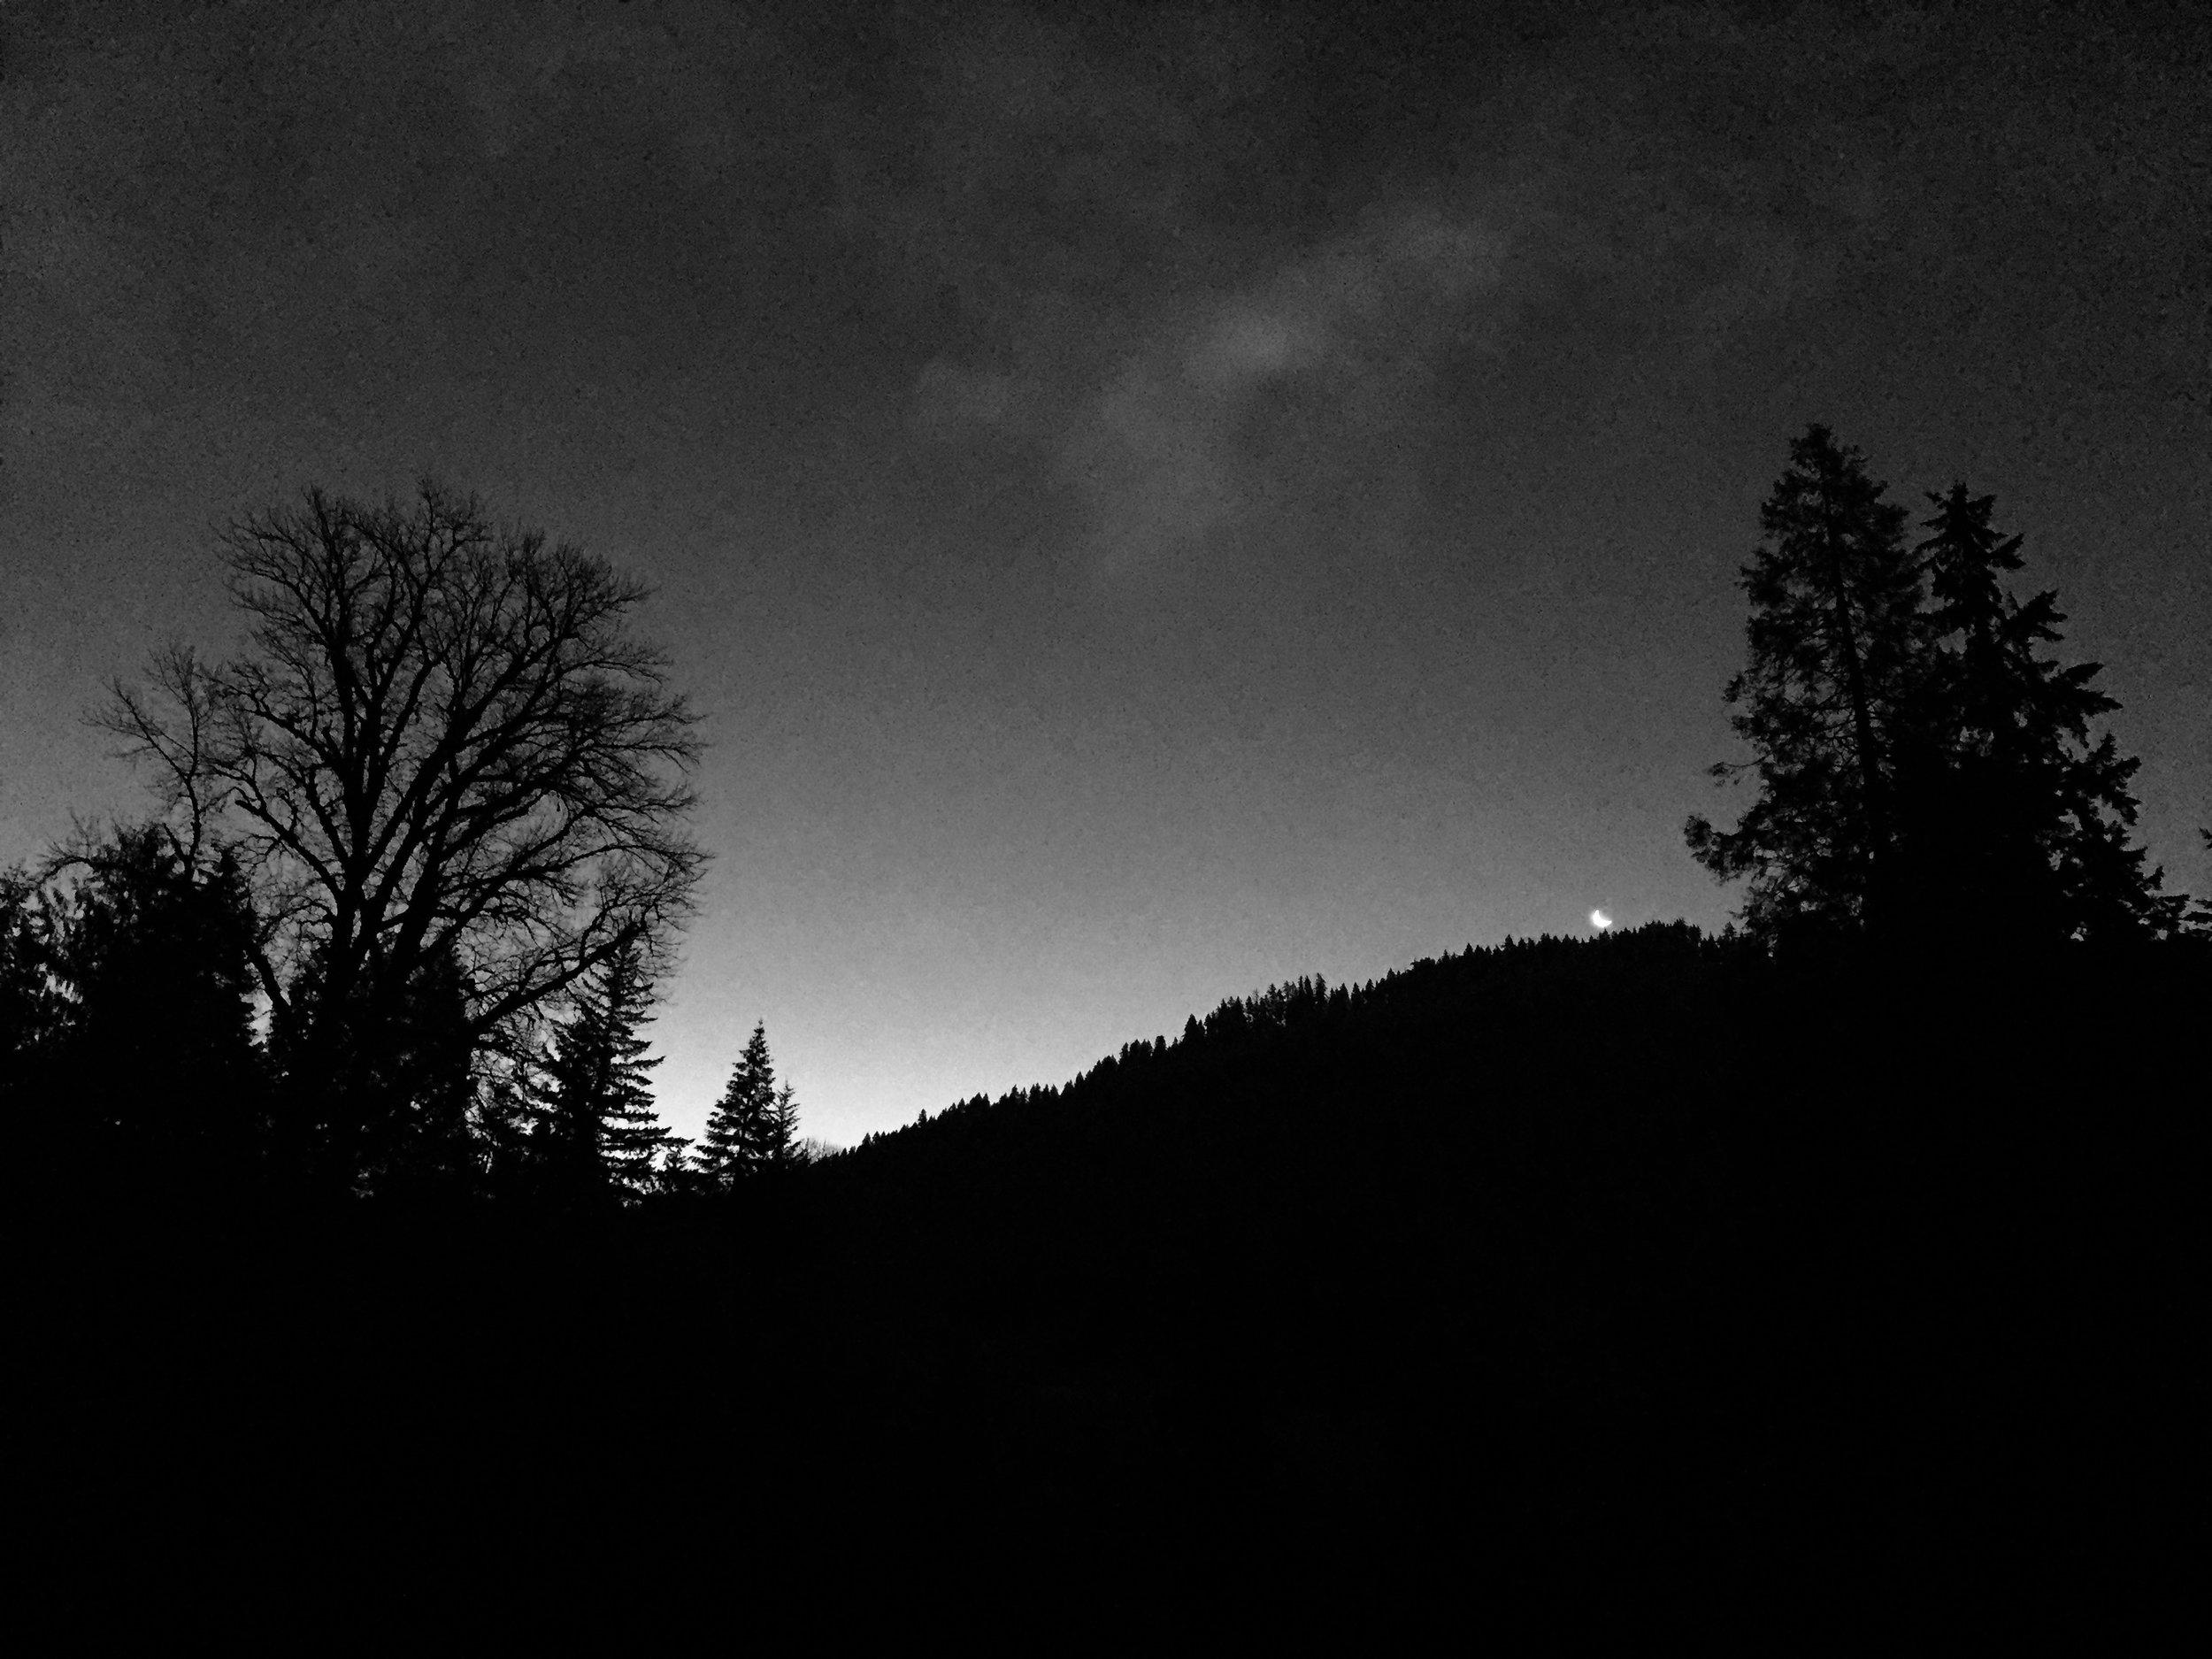 """Moonset over the Mountain"" John Frederick Christmas Morning 2016"